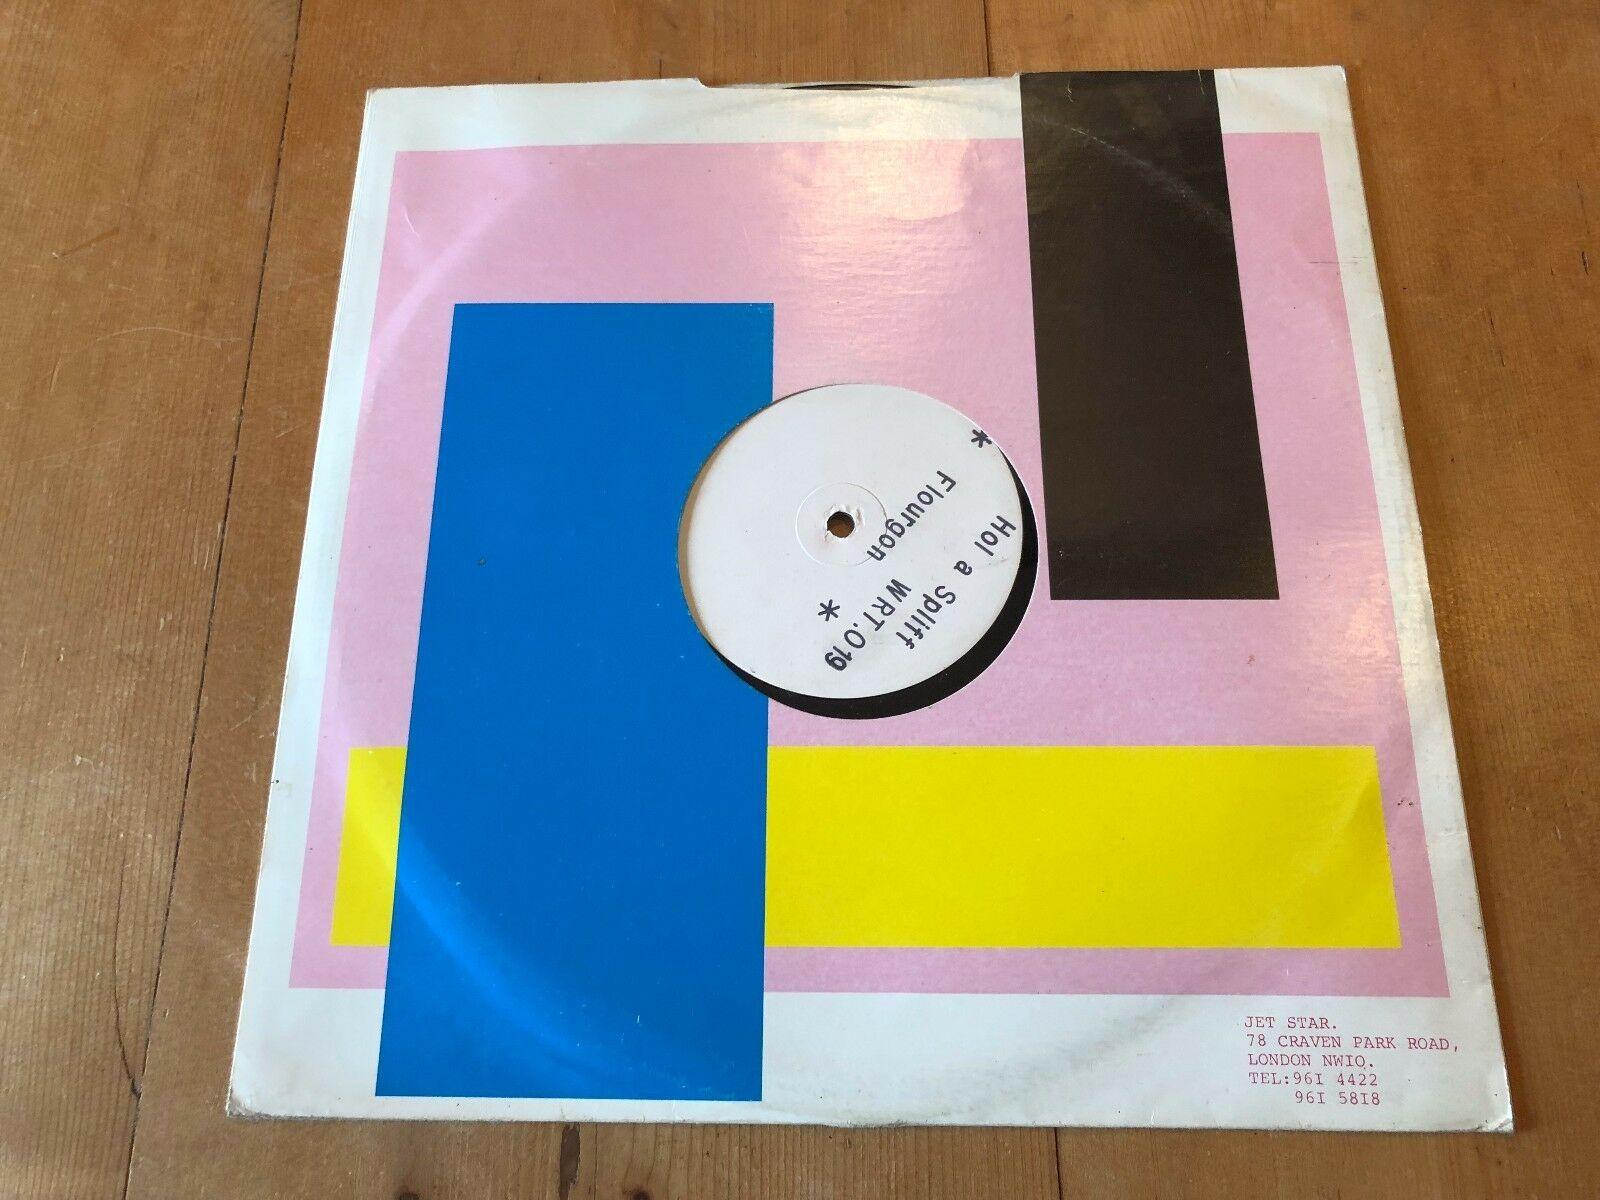 HOLA CANUTO / WRT 019 / FLOURGON RAP HIP HOP VINILO 30.5cm SOLO RECORD